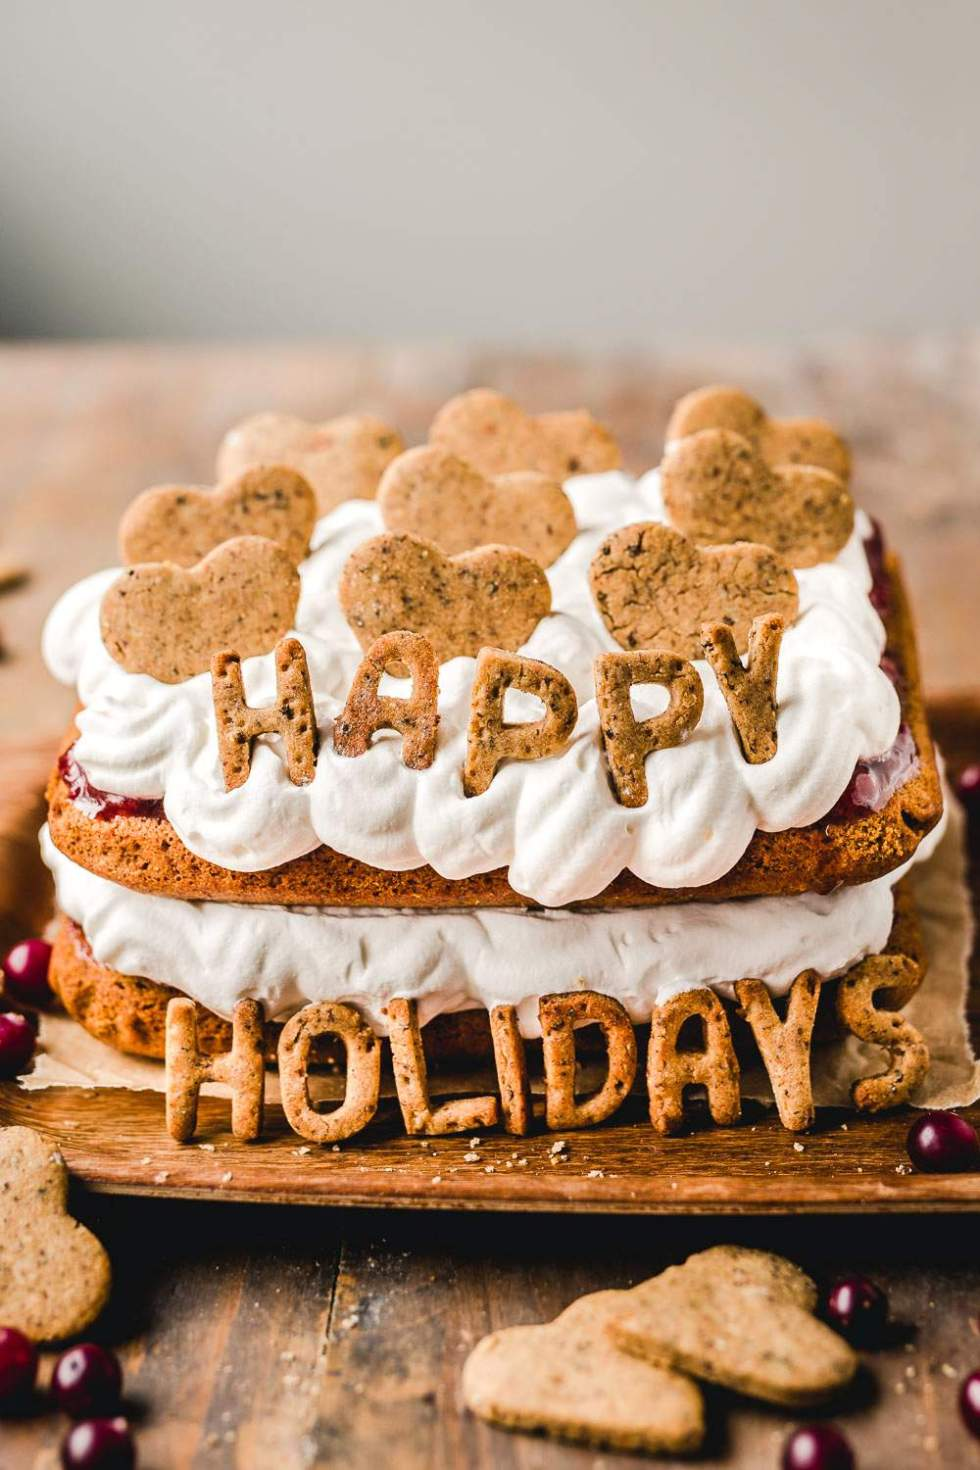 Gluten-free gingerbread cookie cake